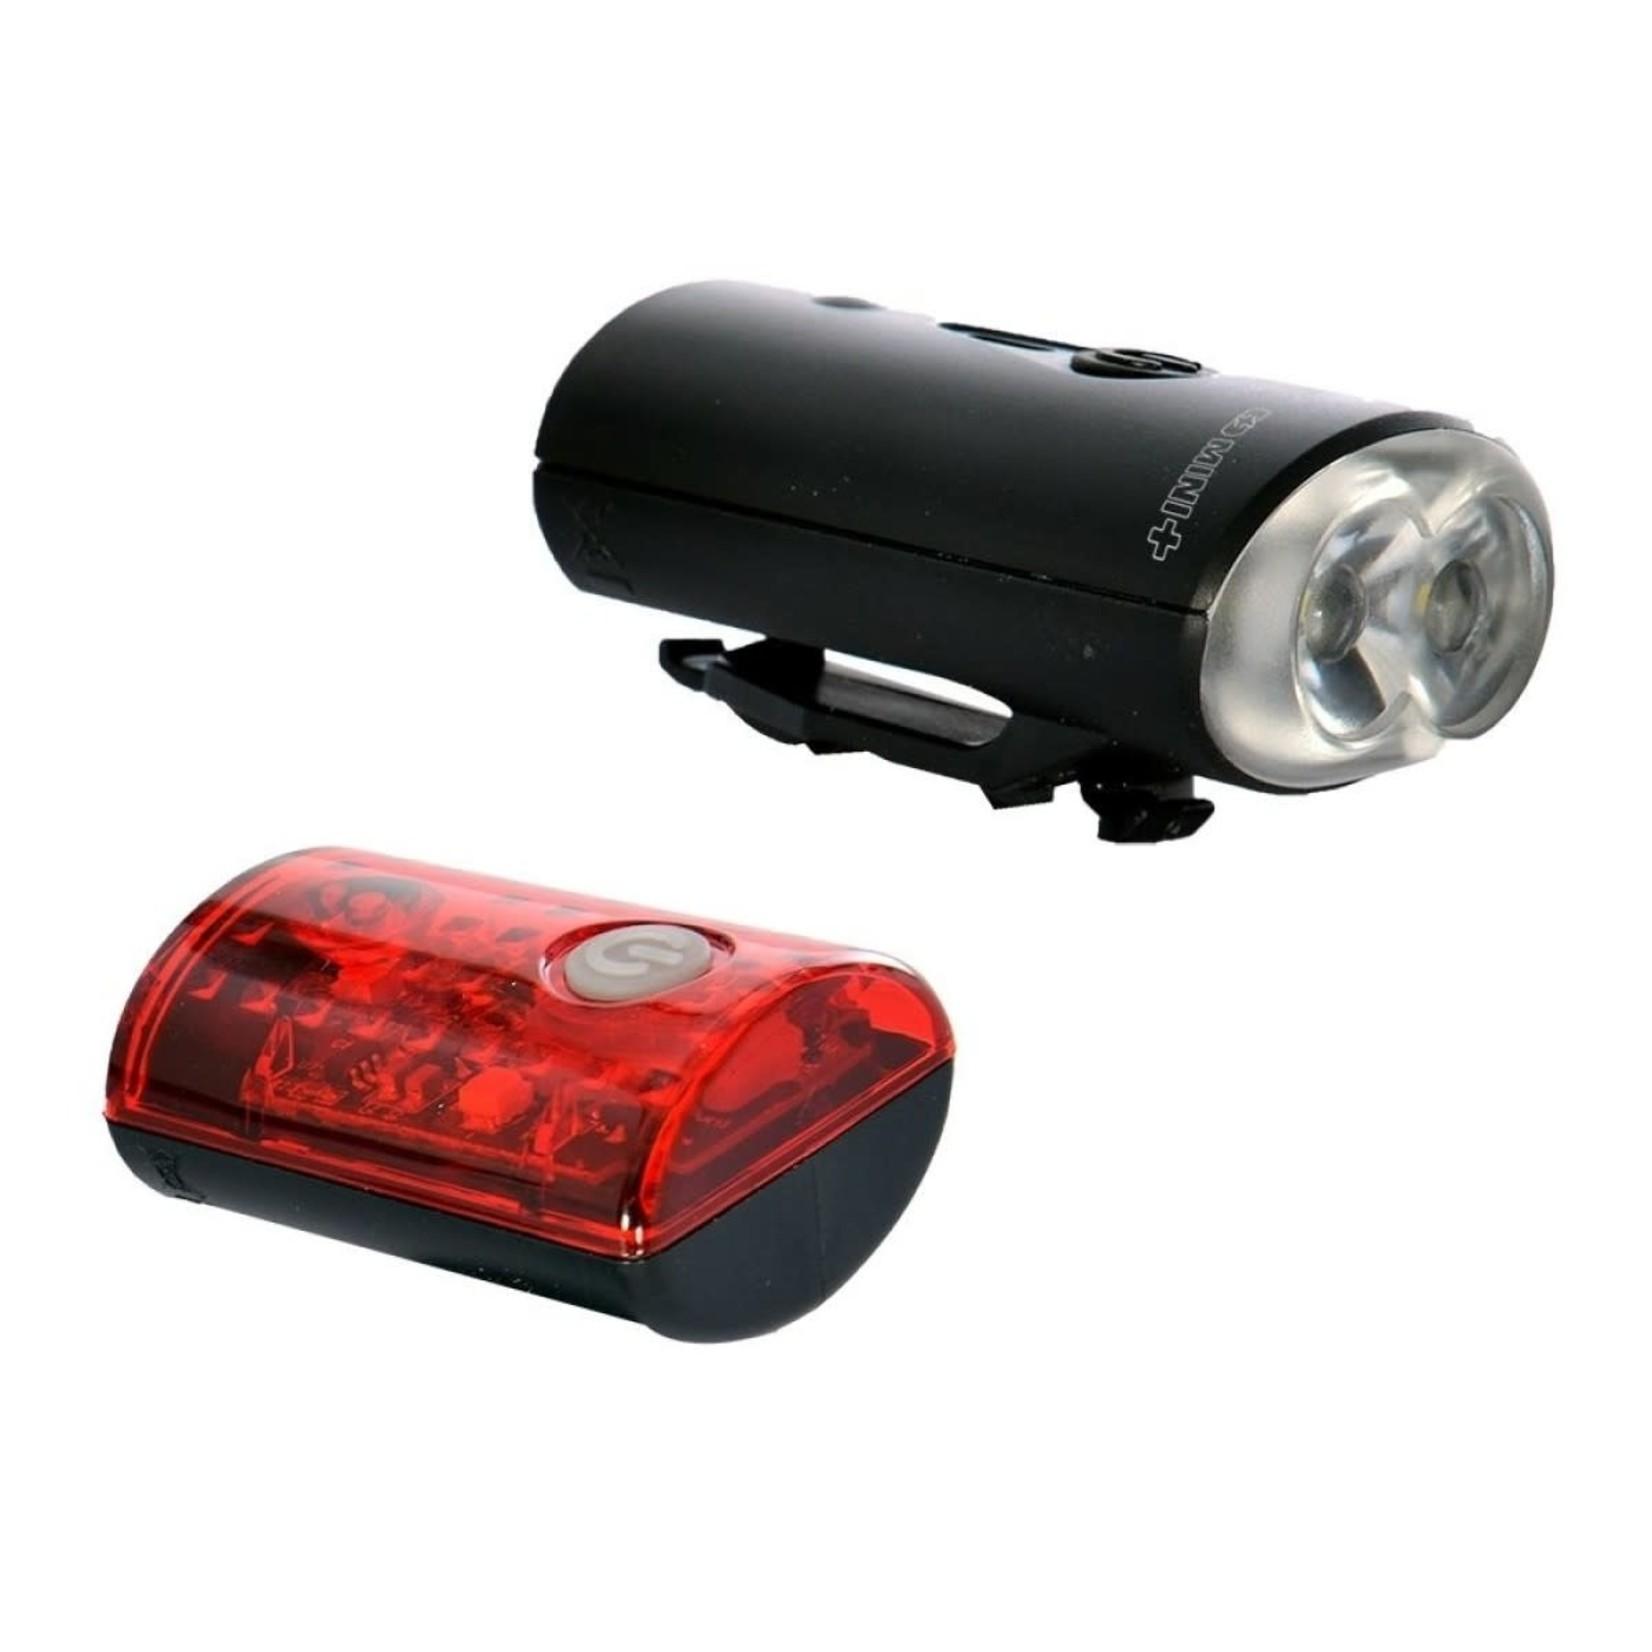 Oxford Ultratorch Mini+ USB Lightset